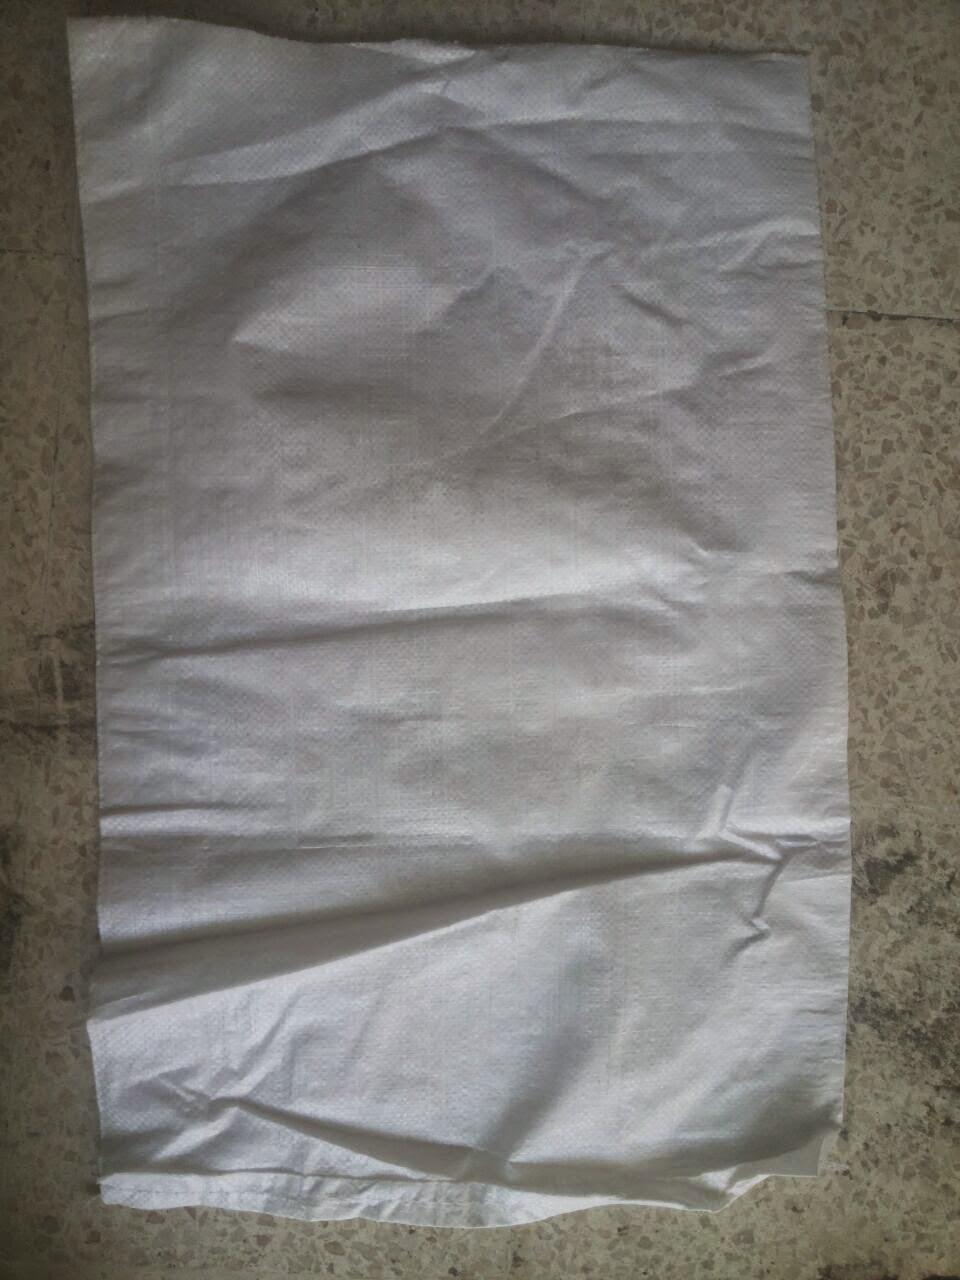 Jual& Produksi Karung plastik kami CV. Balqis Surabaya